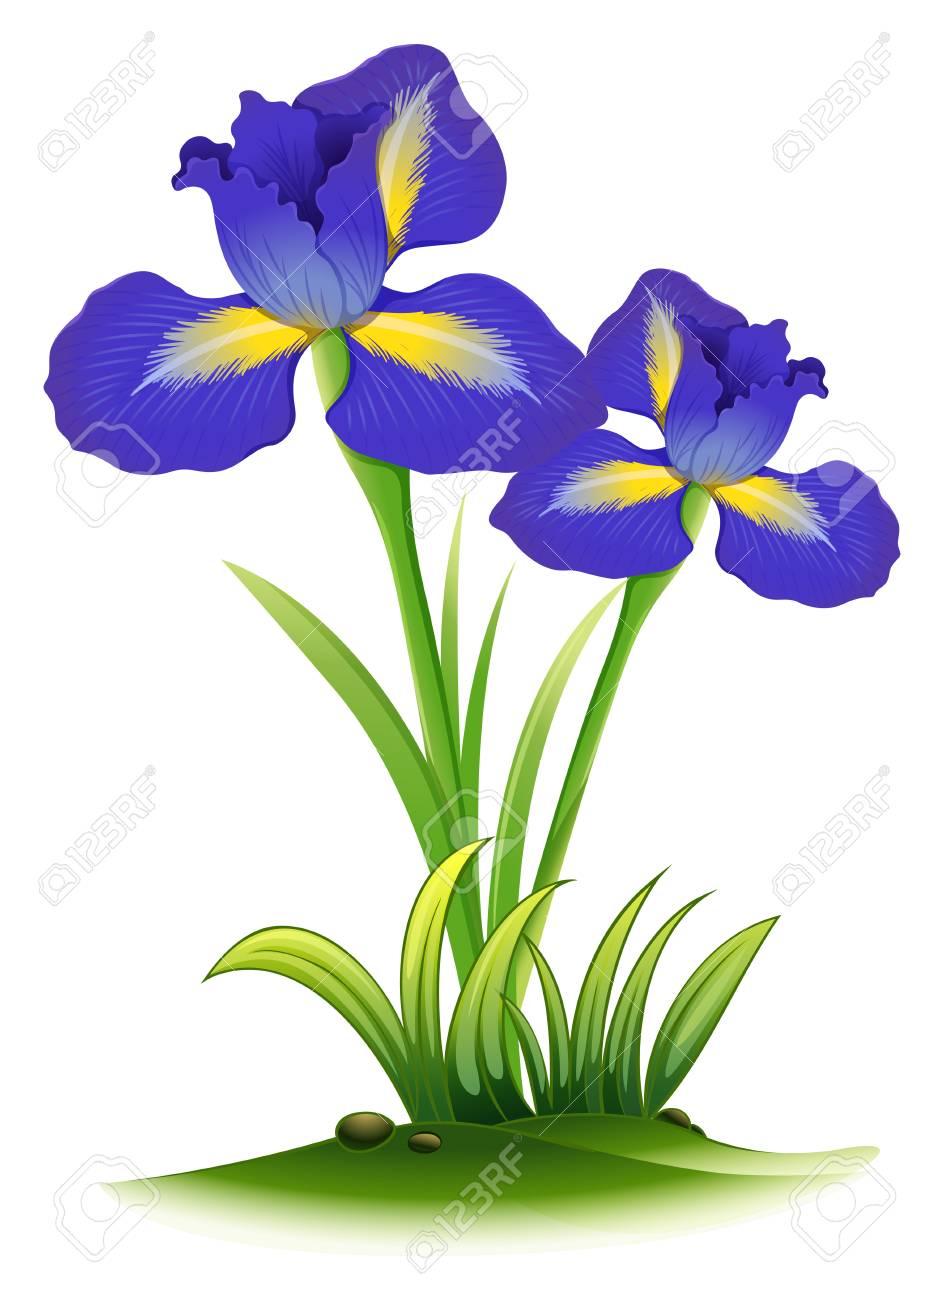 Blue Iris Flowers In Bush Illustration Royalty Free Cliparts